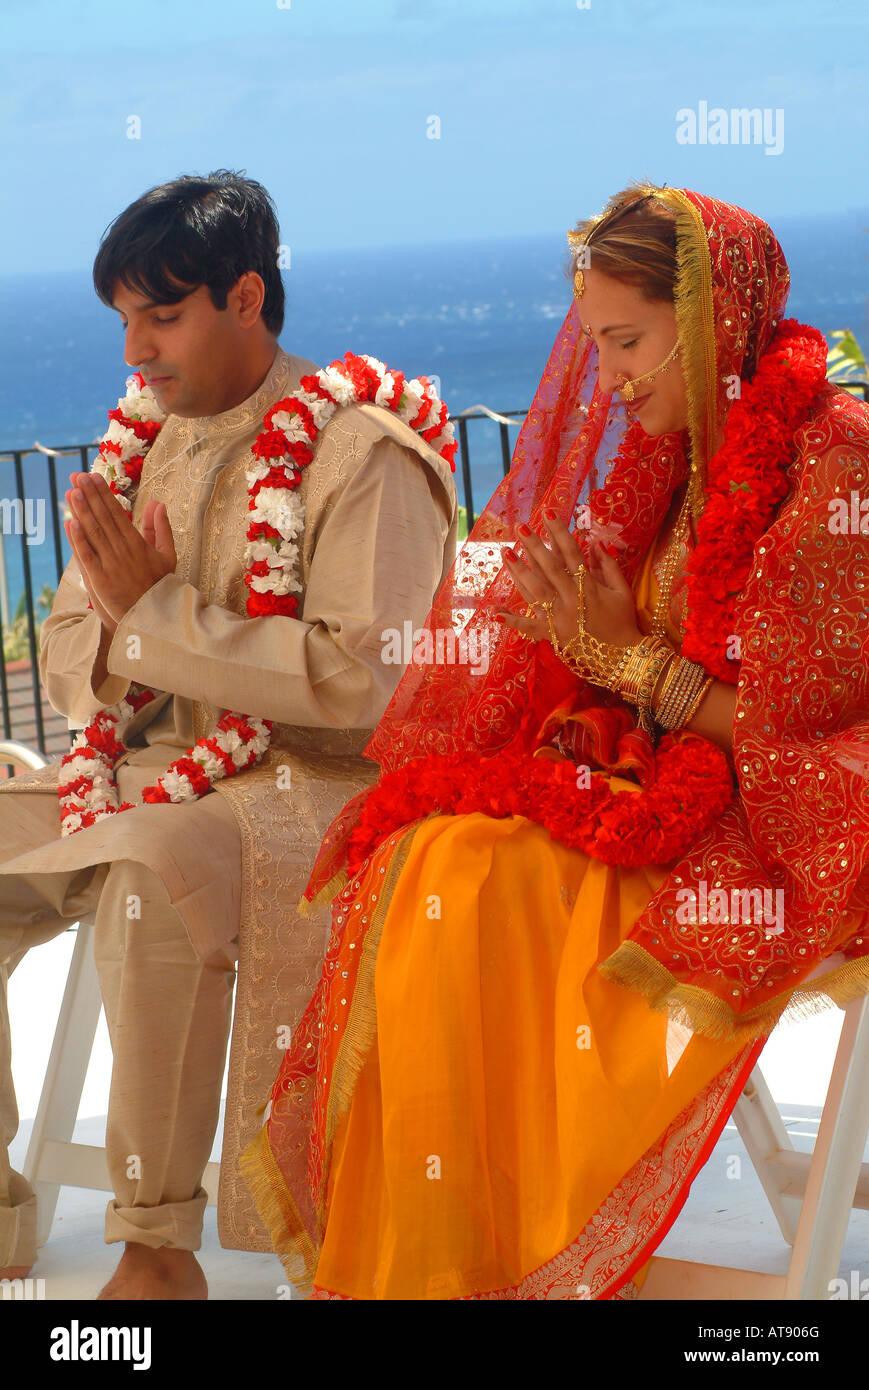 Tradditional Hindi wedding with groom wearing carnation